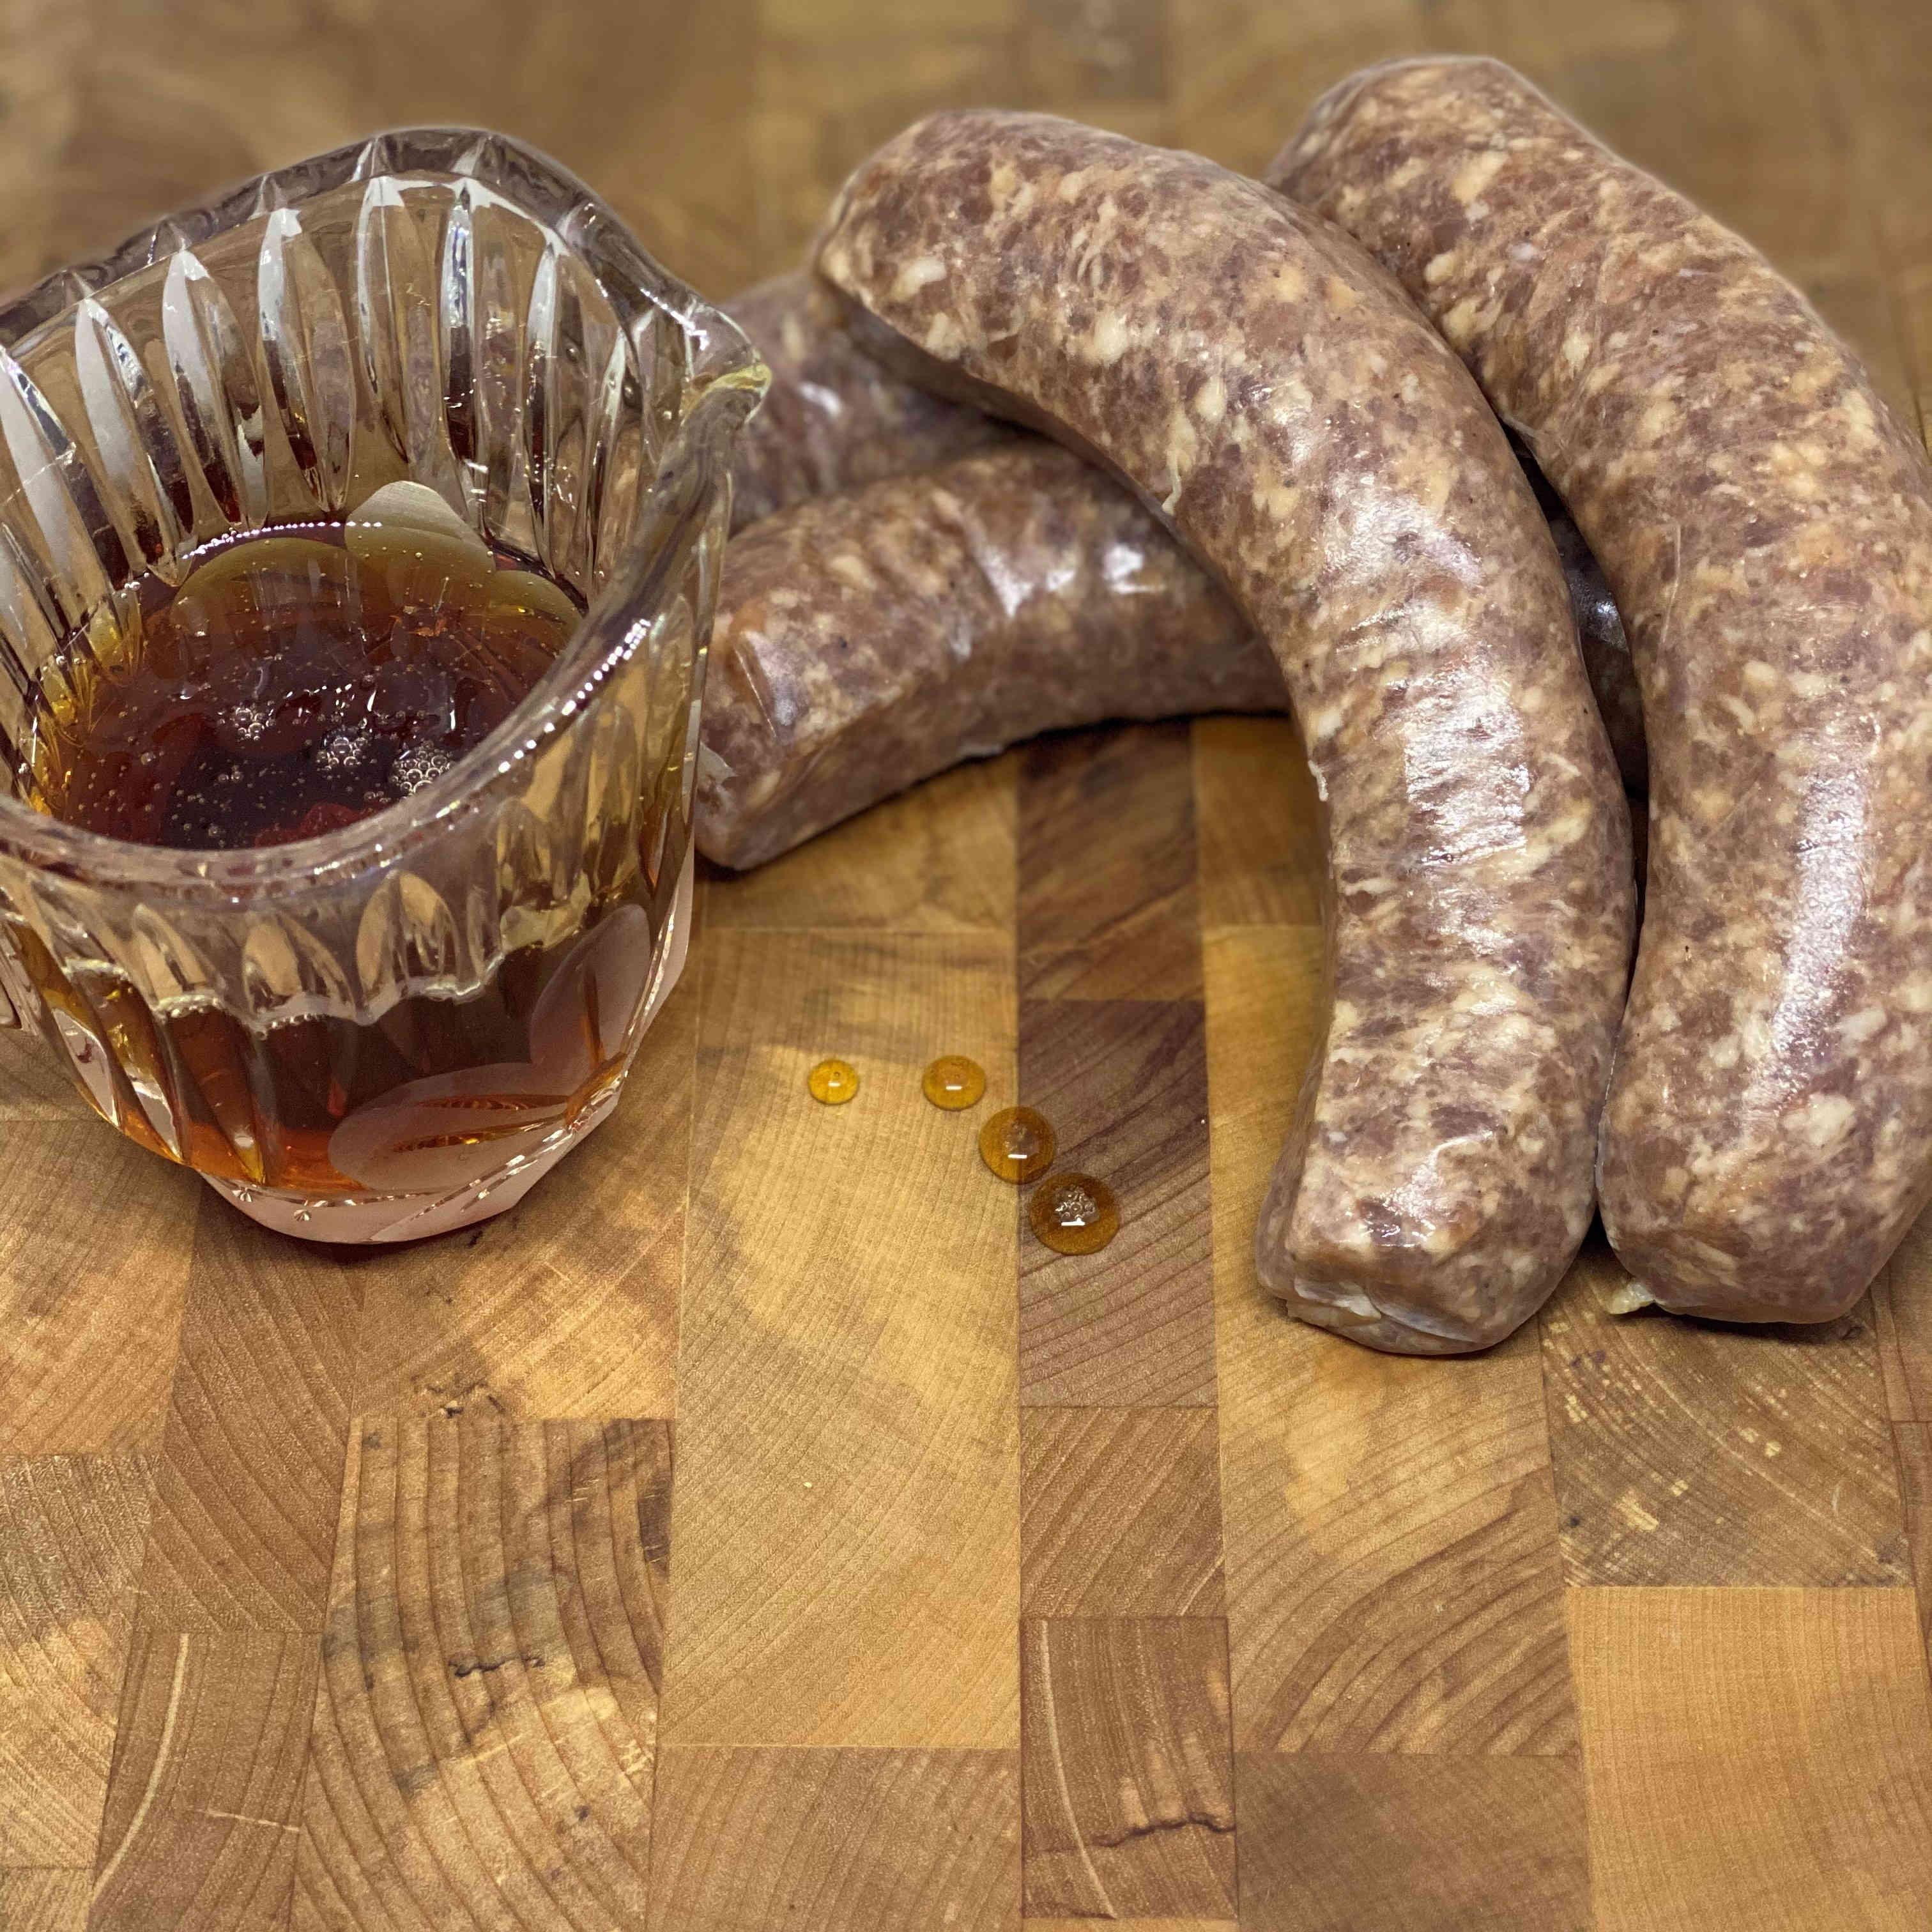 Pork Sausage - Maple Breakfast (4 per pack)